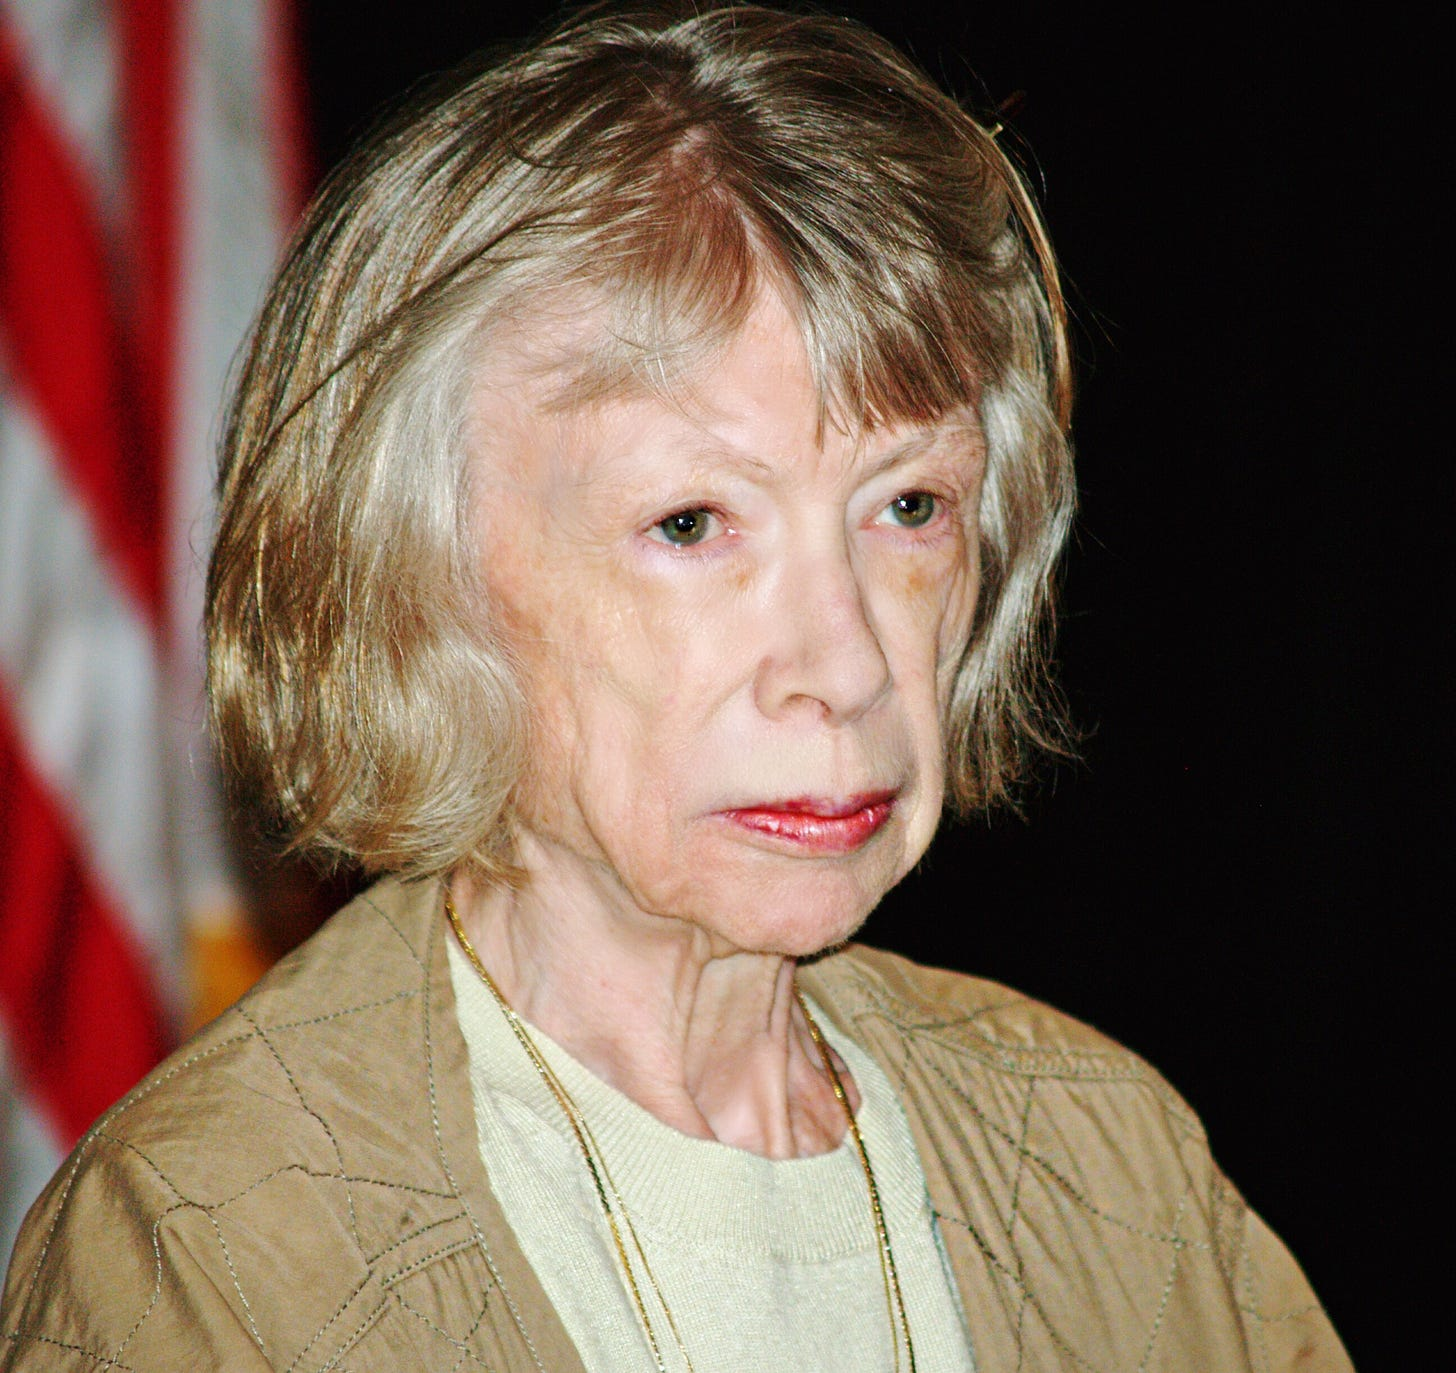 https://upload.wikimedia.org/wikipedia/commons/7/7b/Joan_Didion_at_the_Brooklyn_Book_Festival.jpg